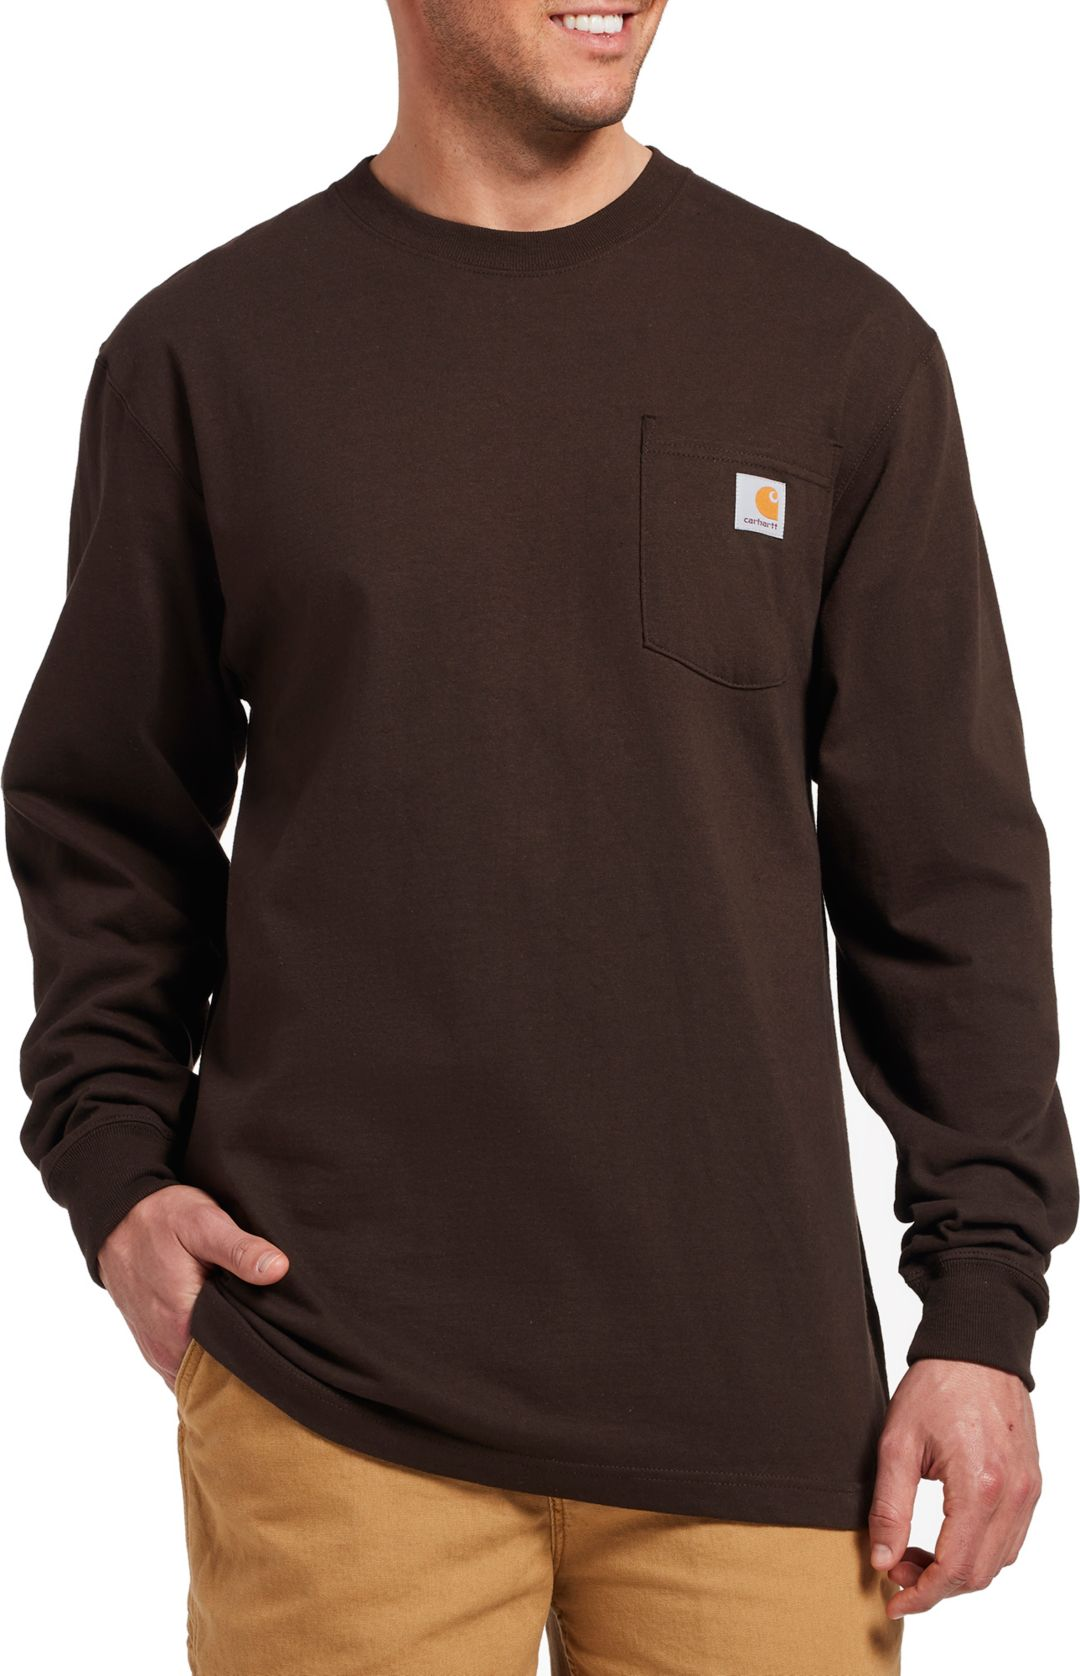 3780c483 Carhartt Men's Workwear Long Sleeve Shirt | DICK'S Sporting Goods